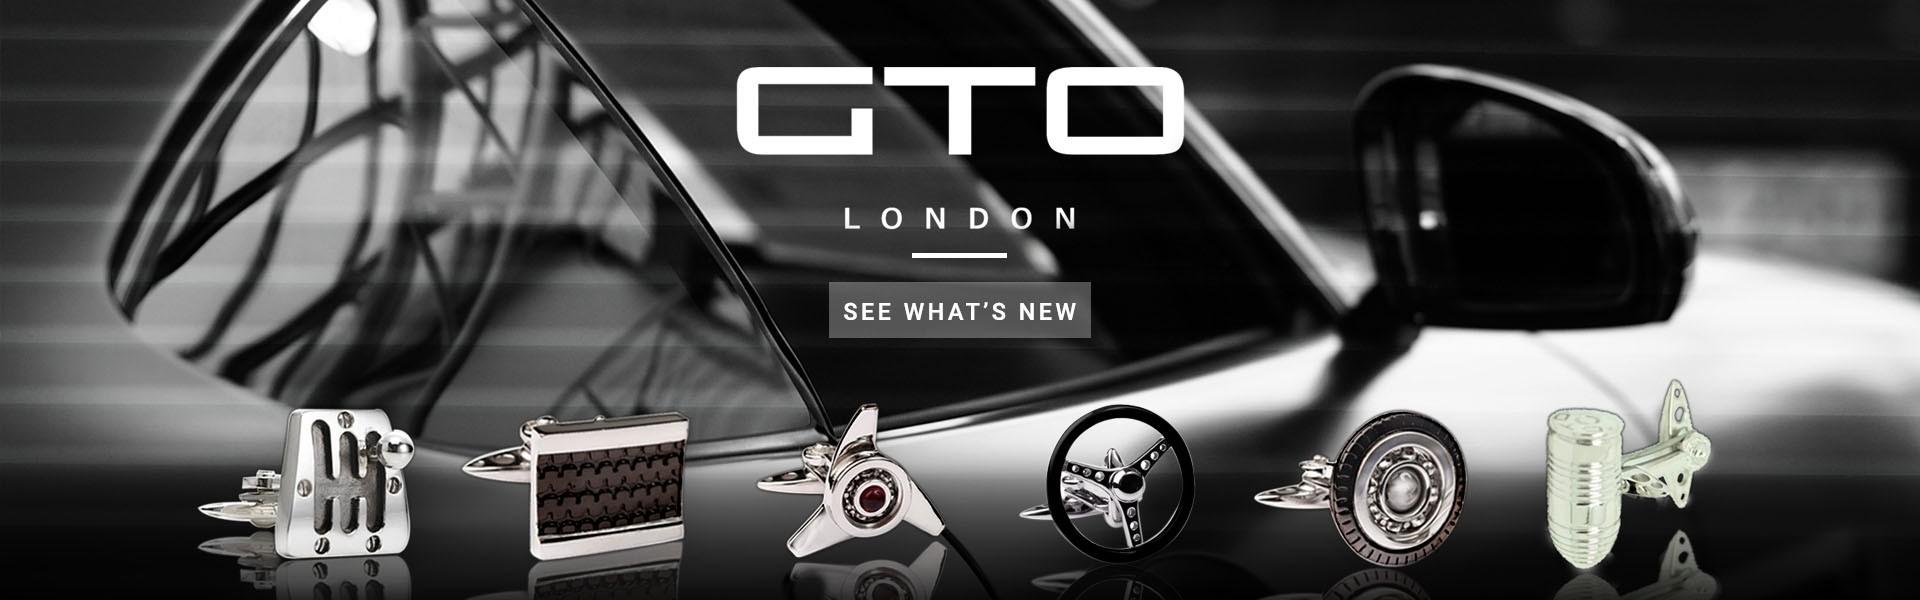 Luxury GTO London Cufflinks